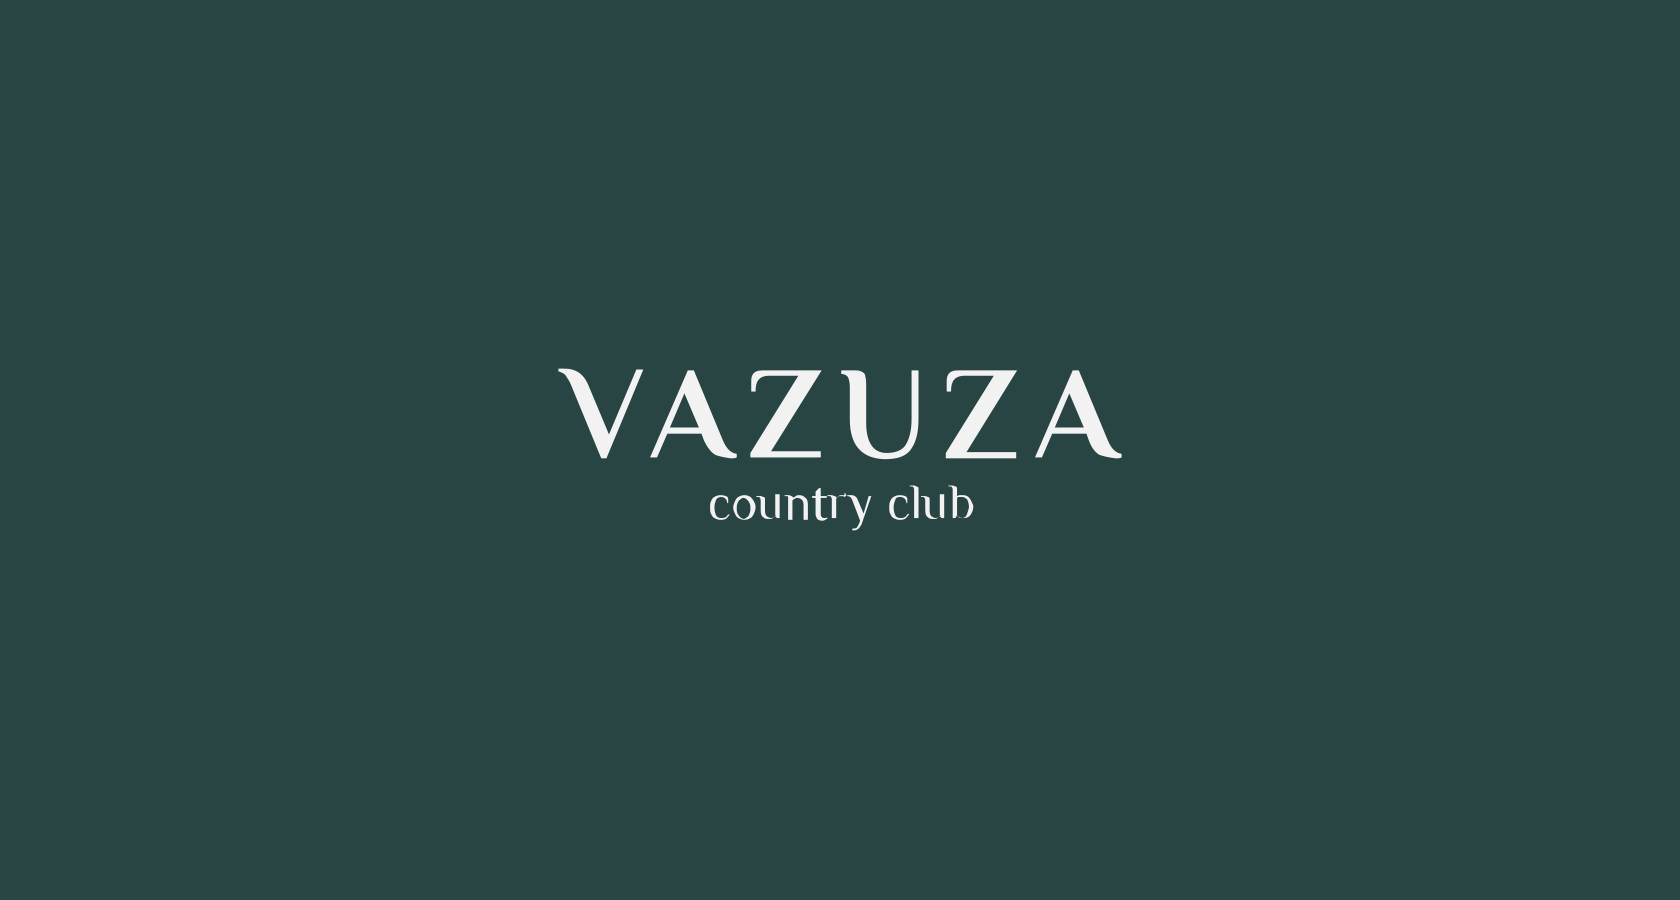 vazuza-club.ru